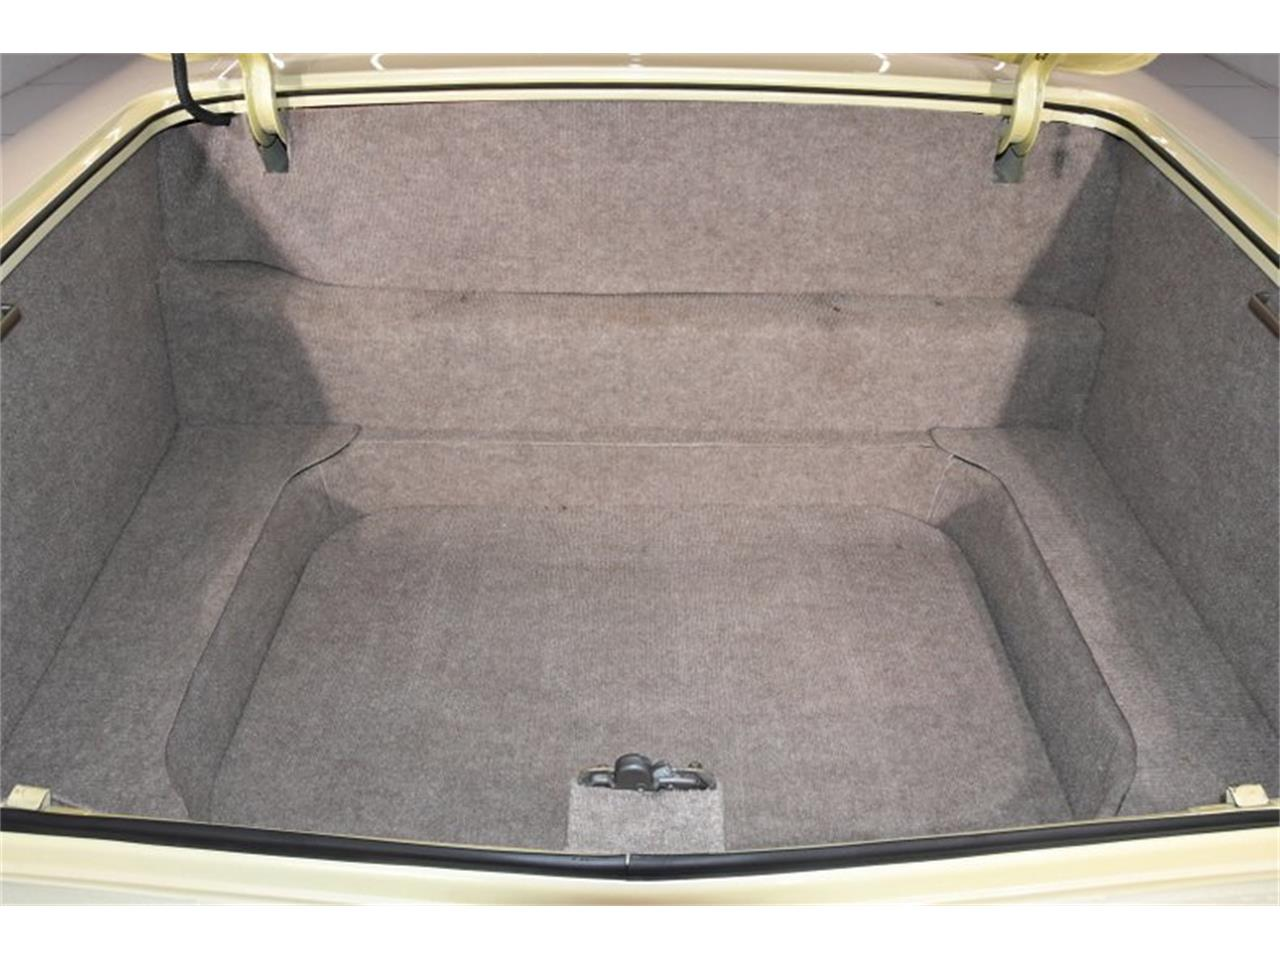 Large Picture of '62 Chevrolet Impala located in Illinois - $51,998.00 - QIVA